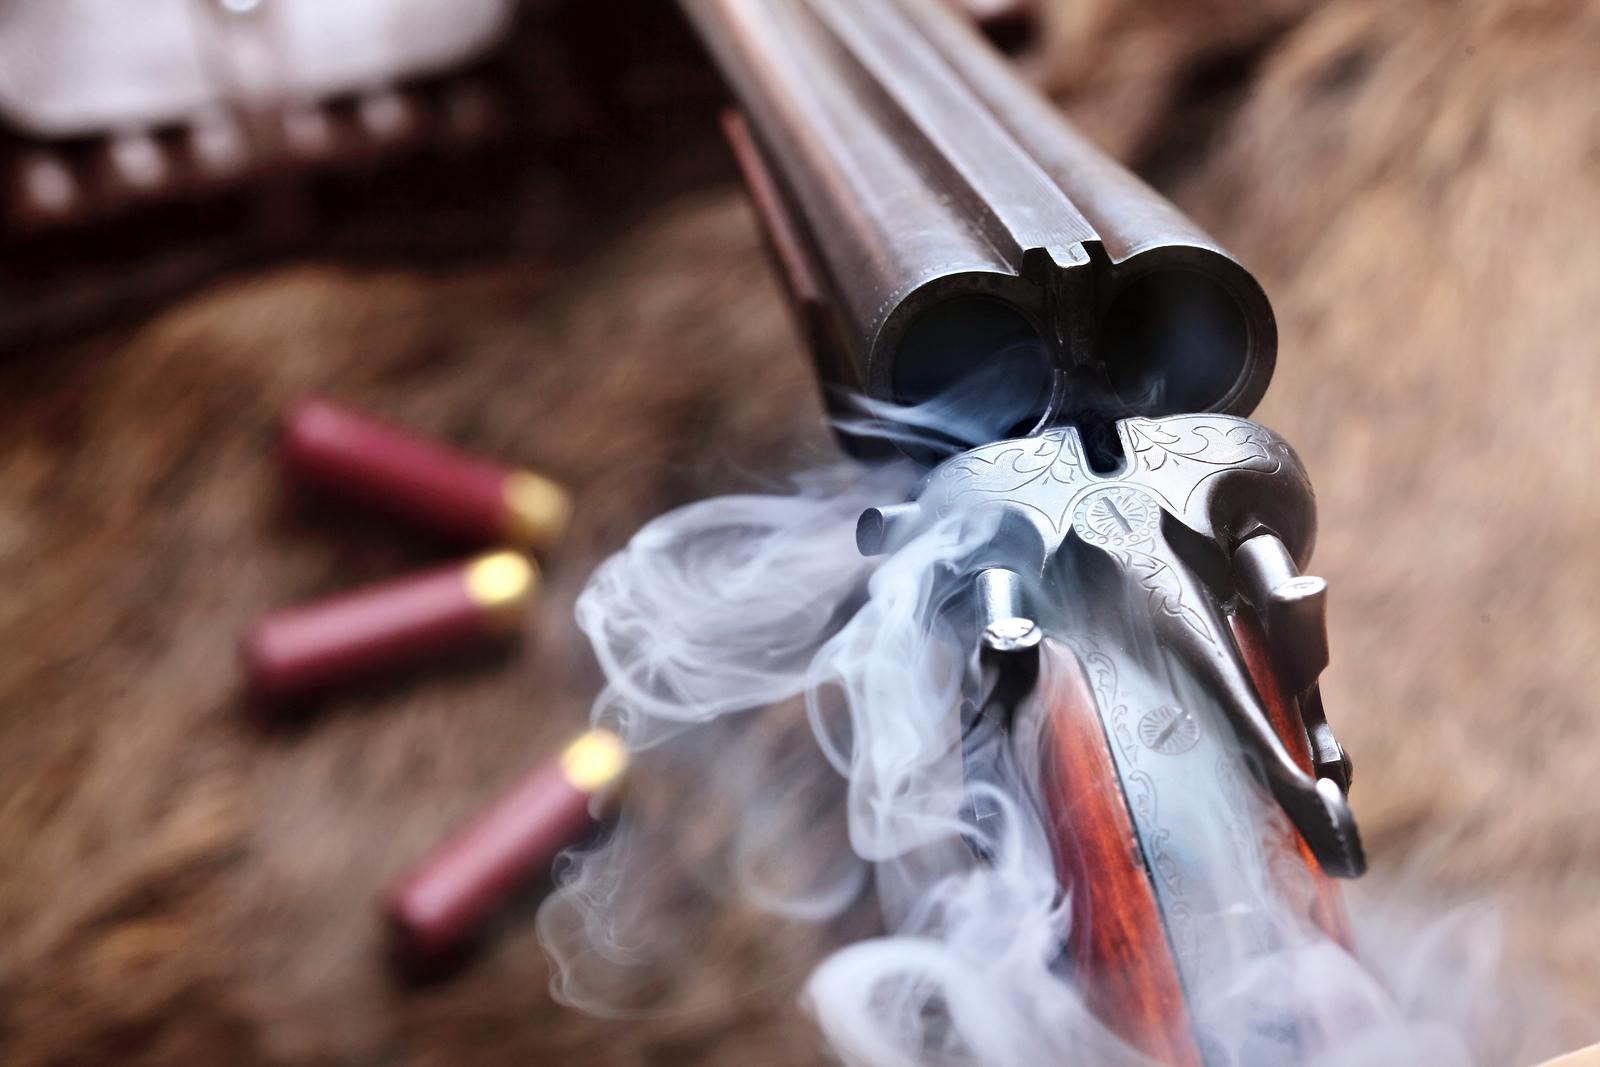 bigstock-Smoke-From-A-Hunting-Double-Ba-208259359.jpg